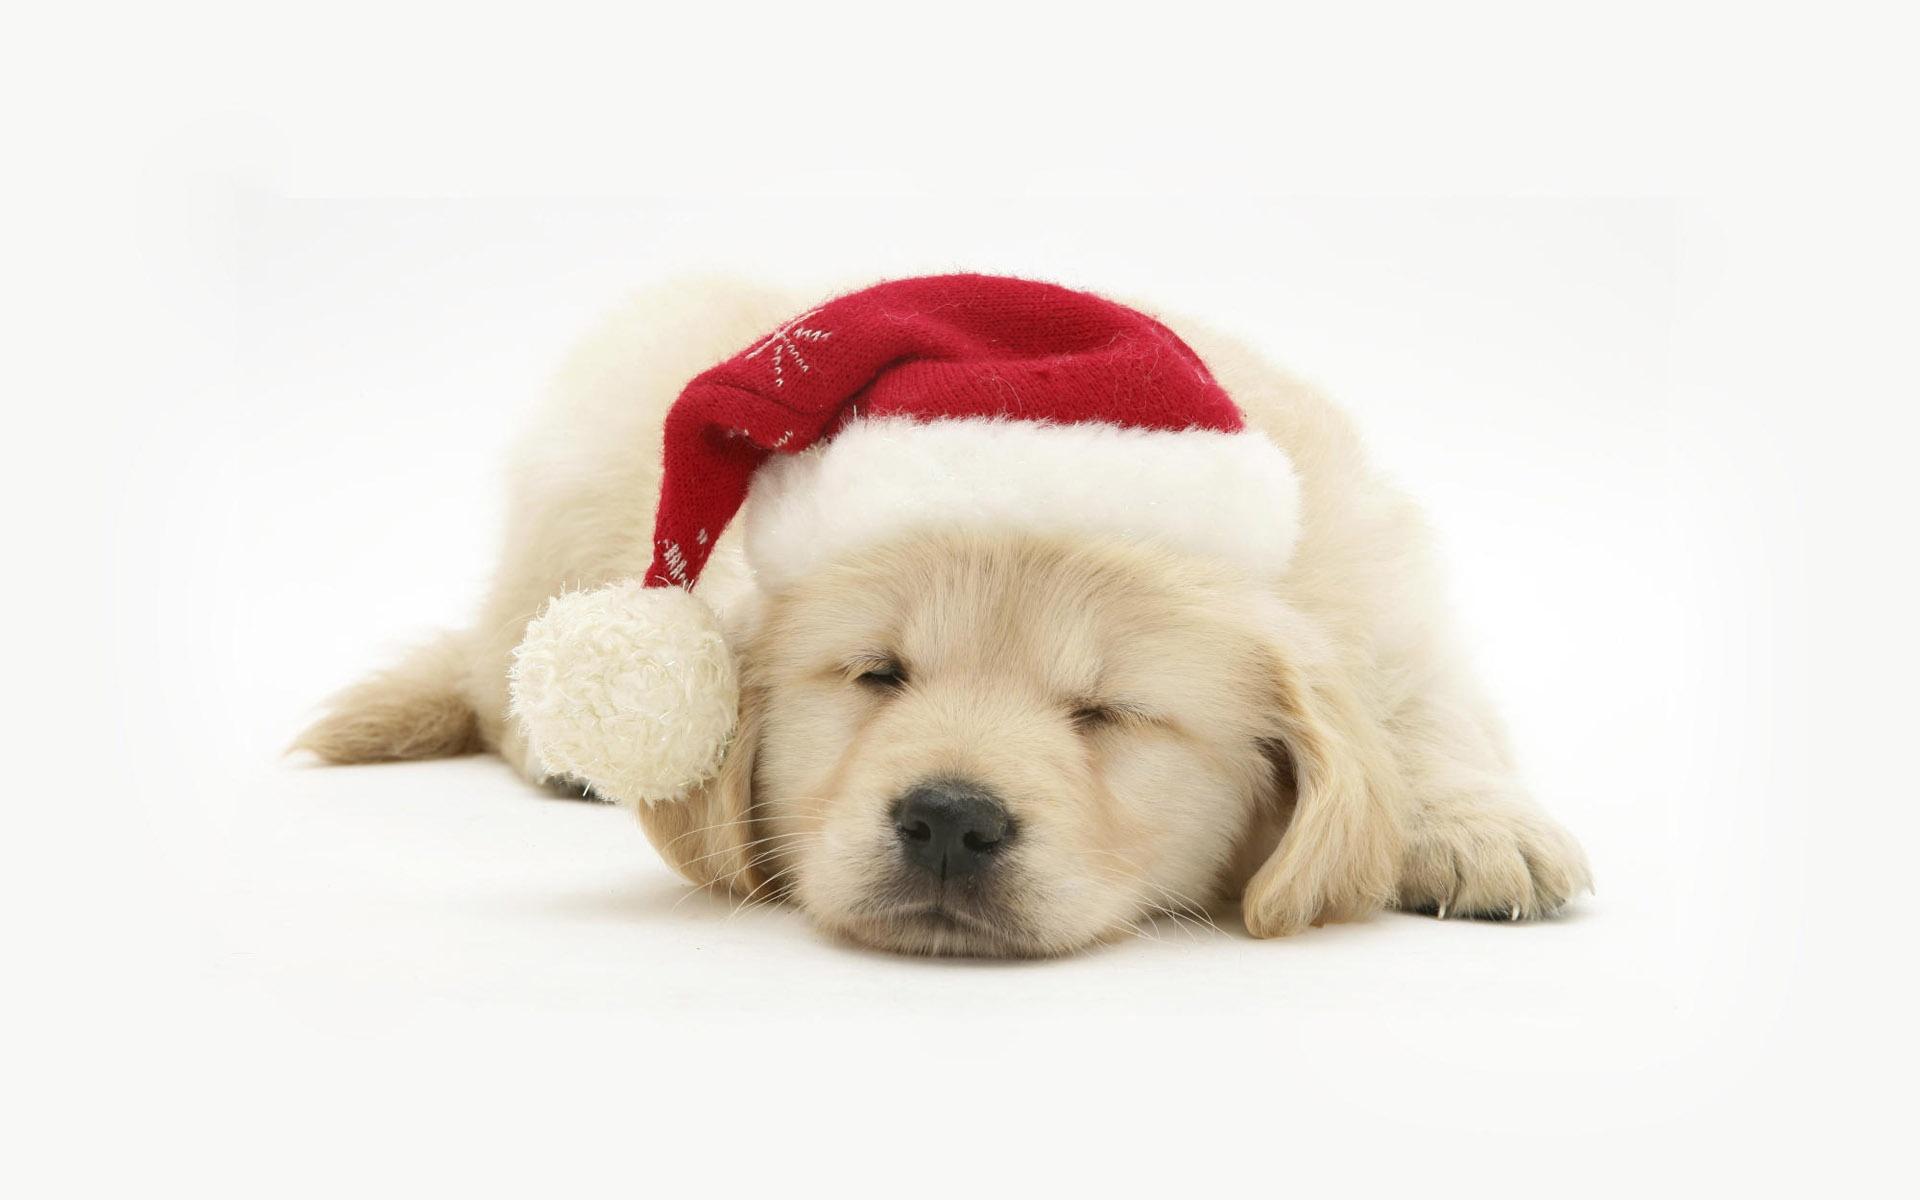 Golden Retriever Puppy Wallpaper Posted By Sarah Mercado